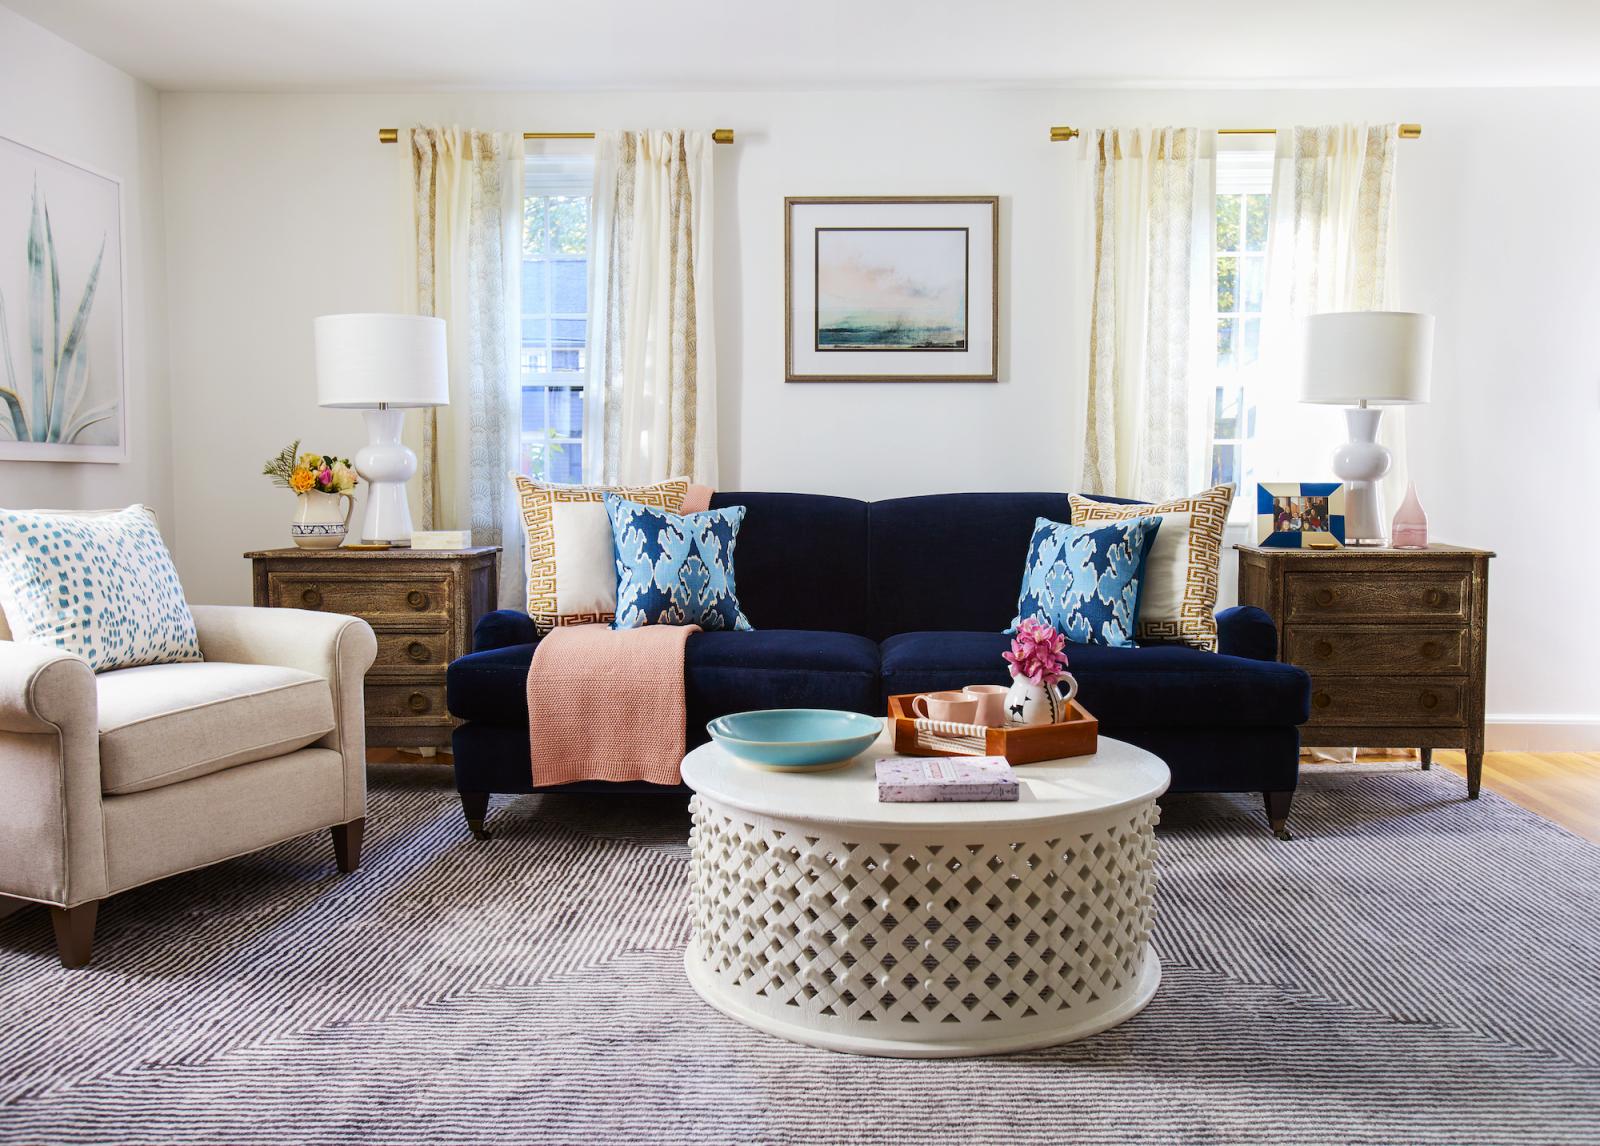 53 Best Living Room Ideas - Stylish Living Room Decorating for Elegant Turquoise Living Room Furniture